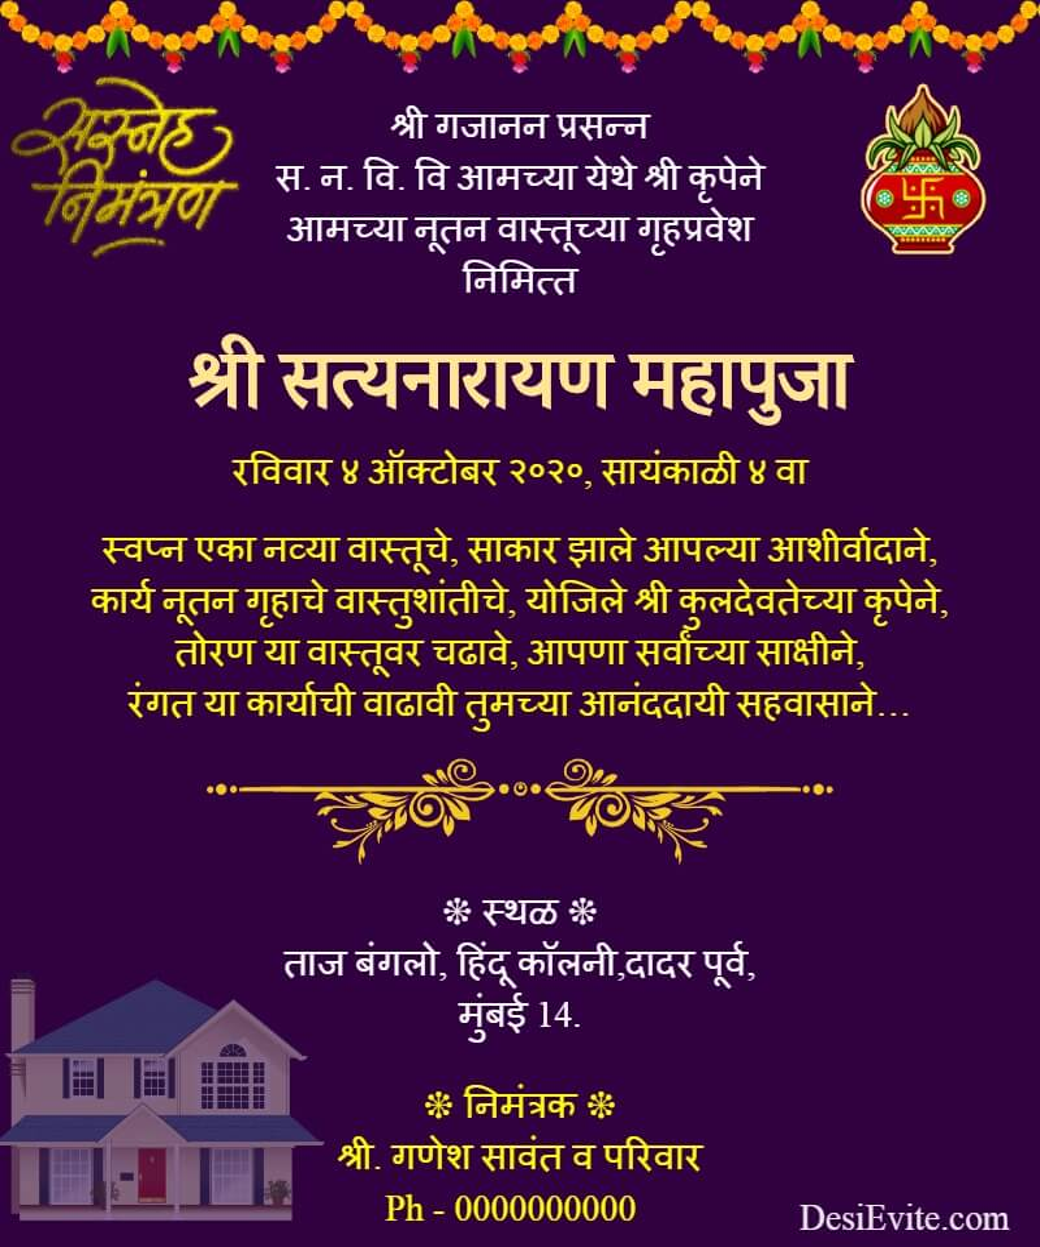 satyanarayan-mahapuja-invitation-card